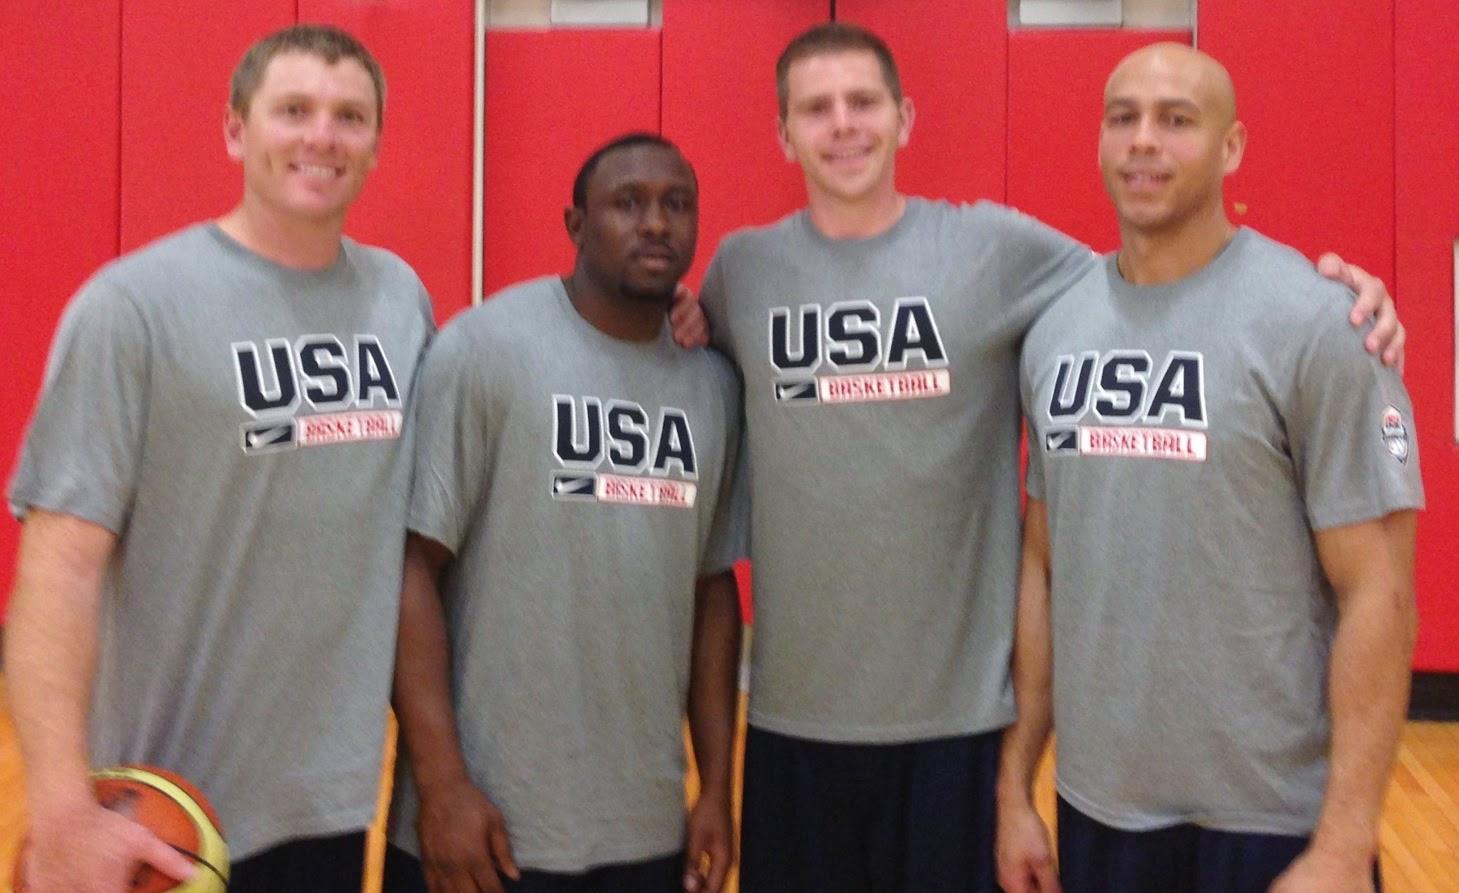 1-13-2015-usa-basketball-partnership-extends-second-year-3